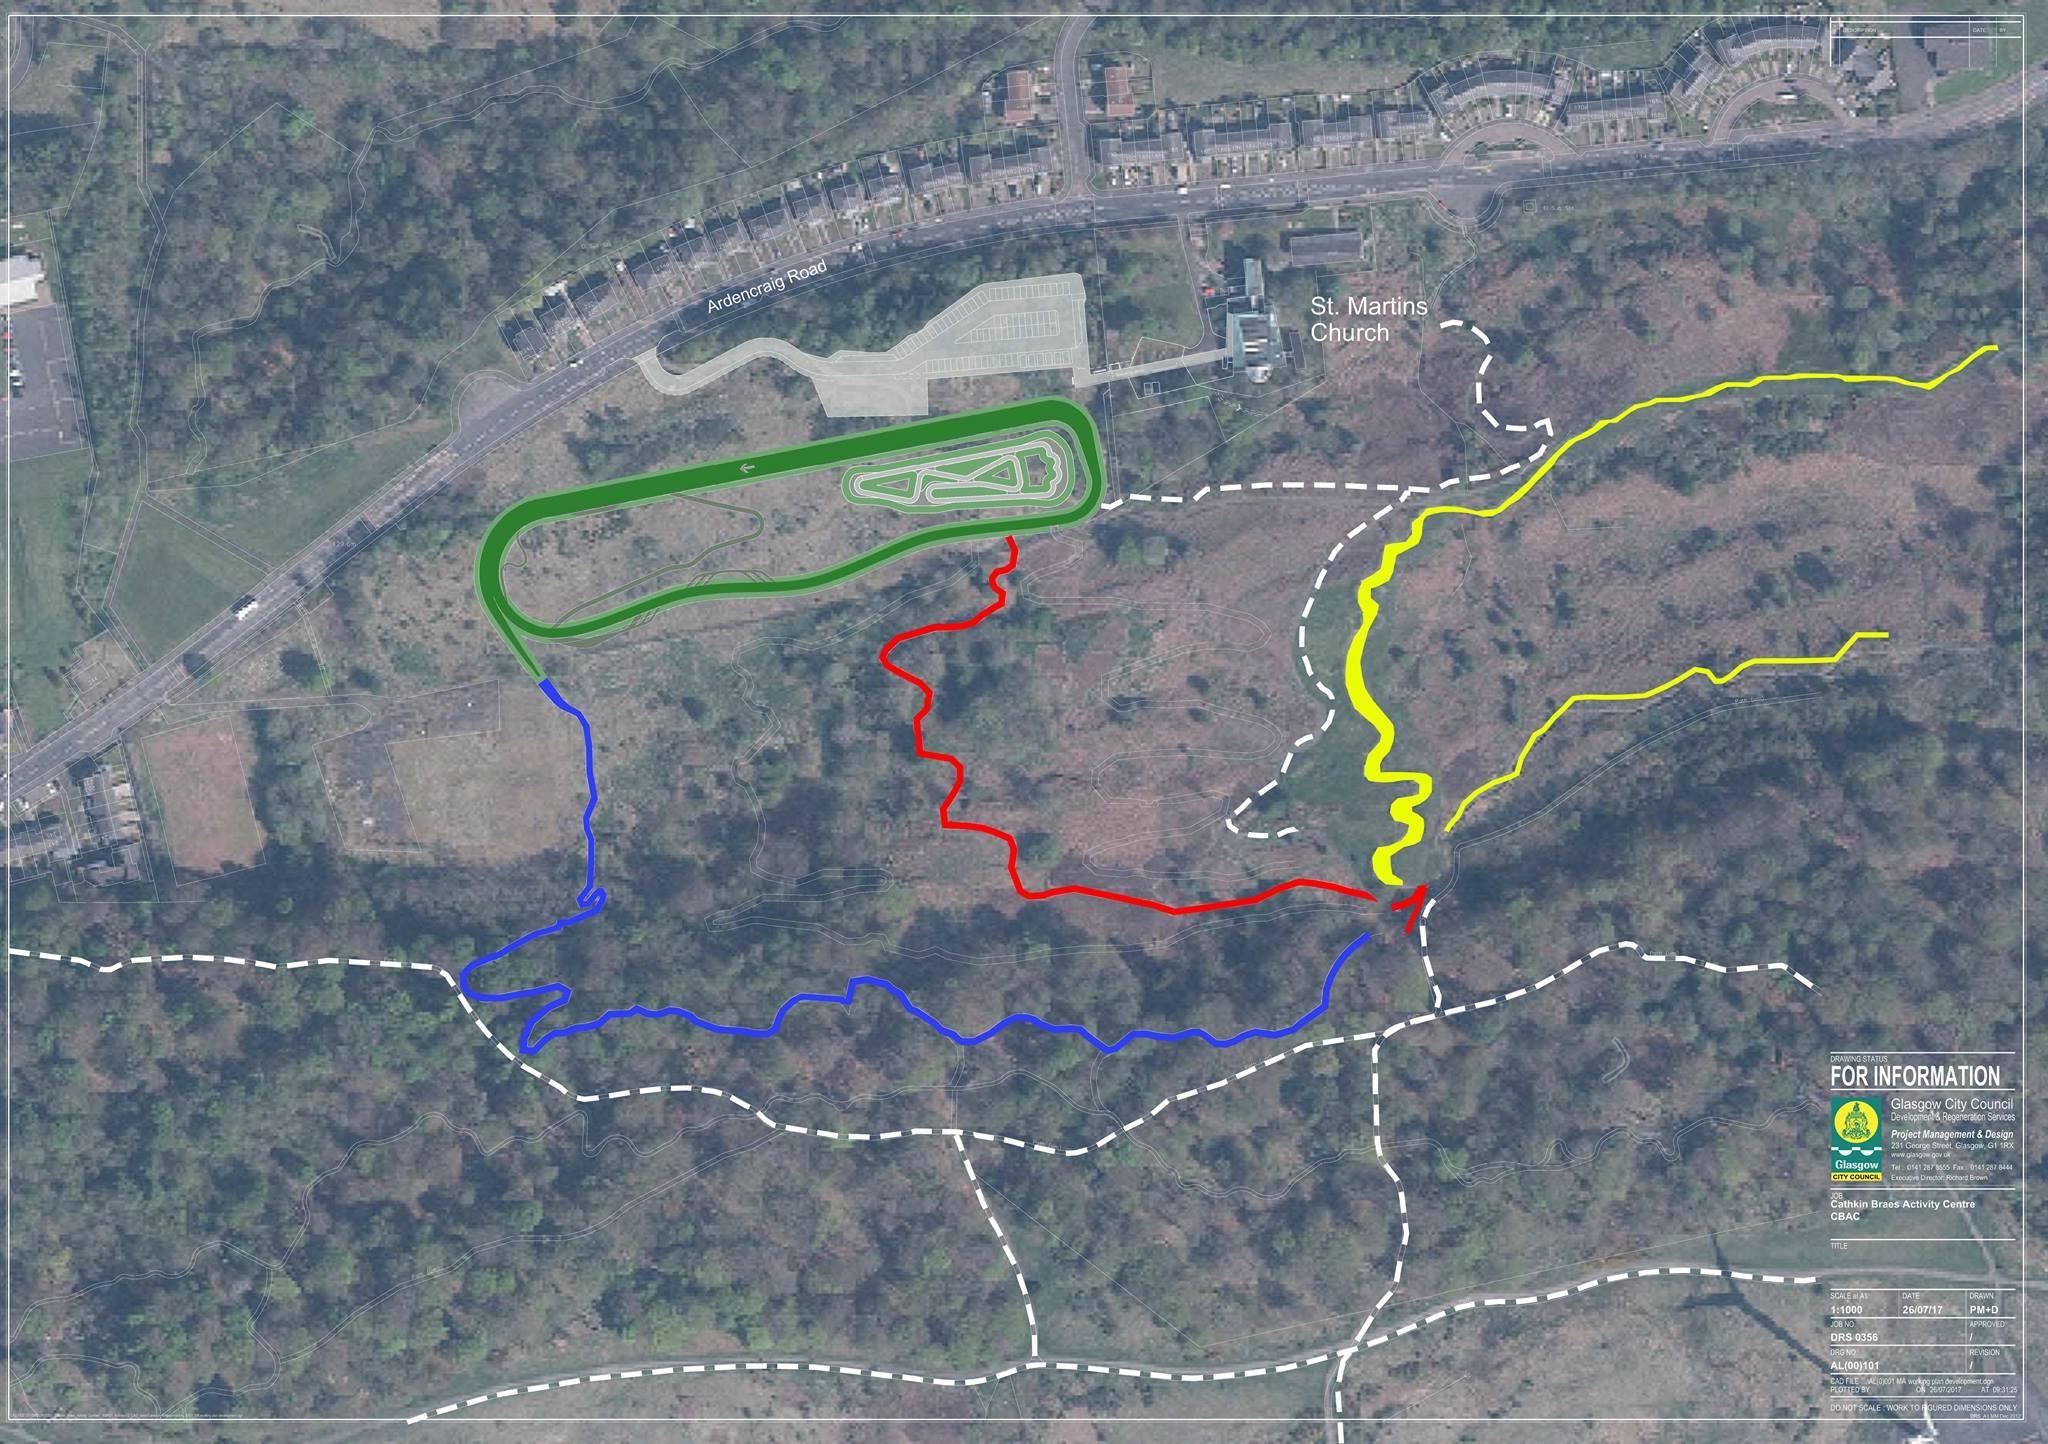 Cathkin Braes Mountain Bike Trails